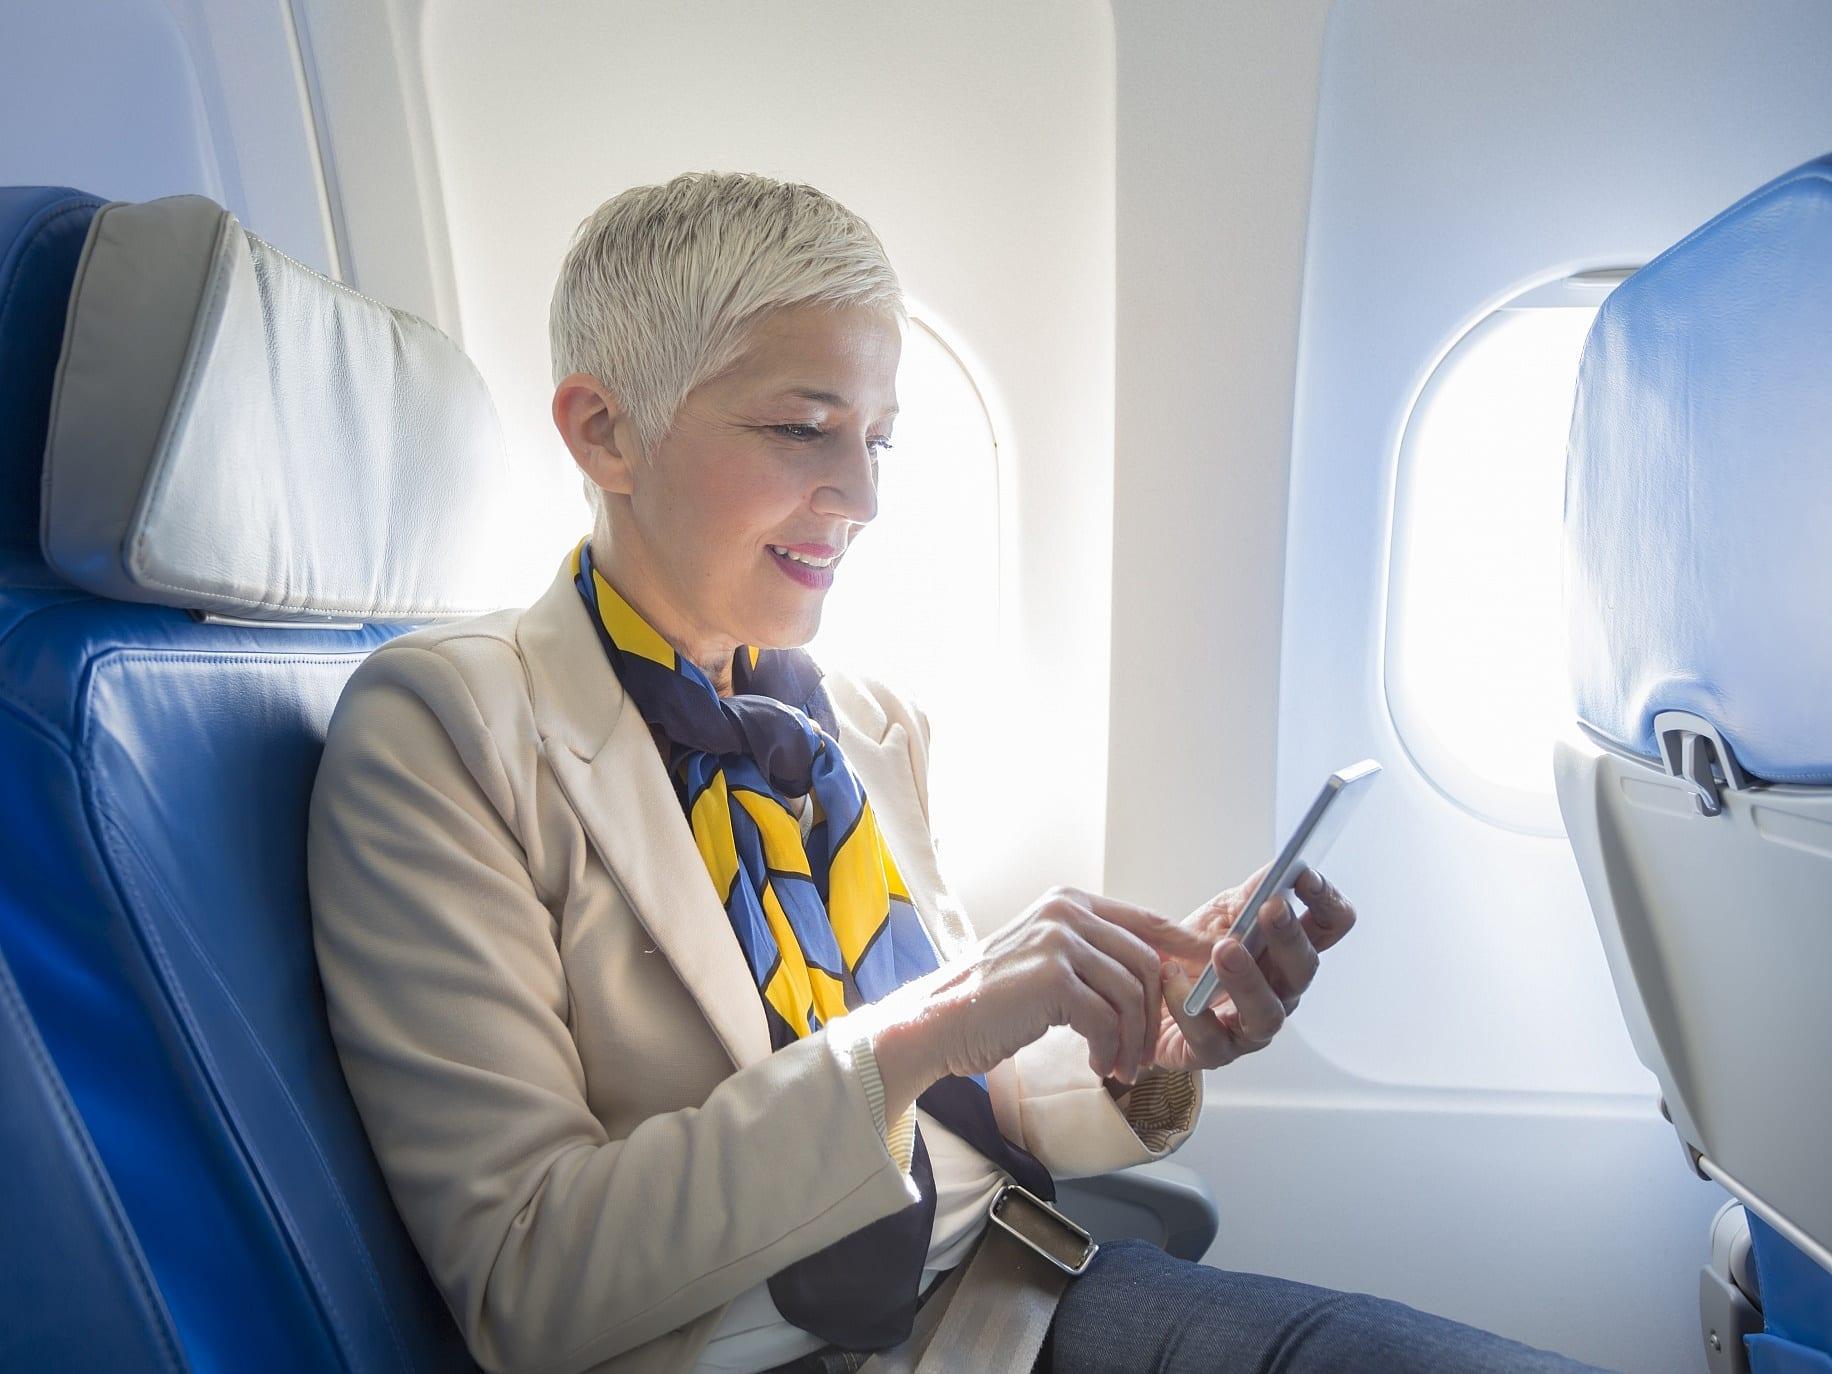 Earn 25000 Air Miles With New Virgin Atlantic Credit Card Bonus